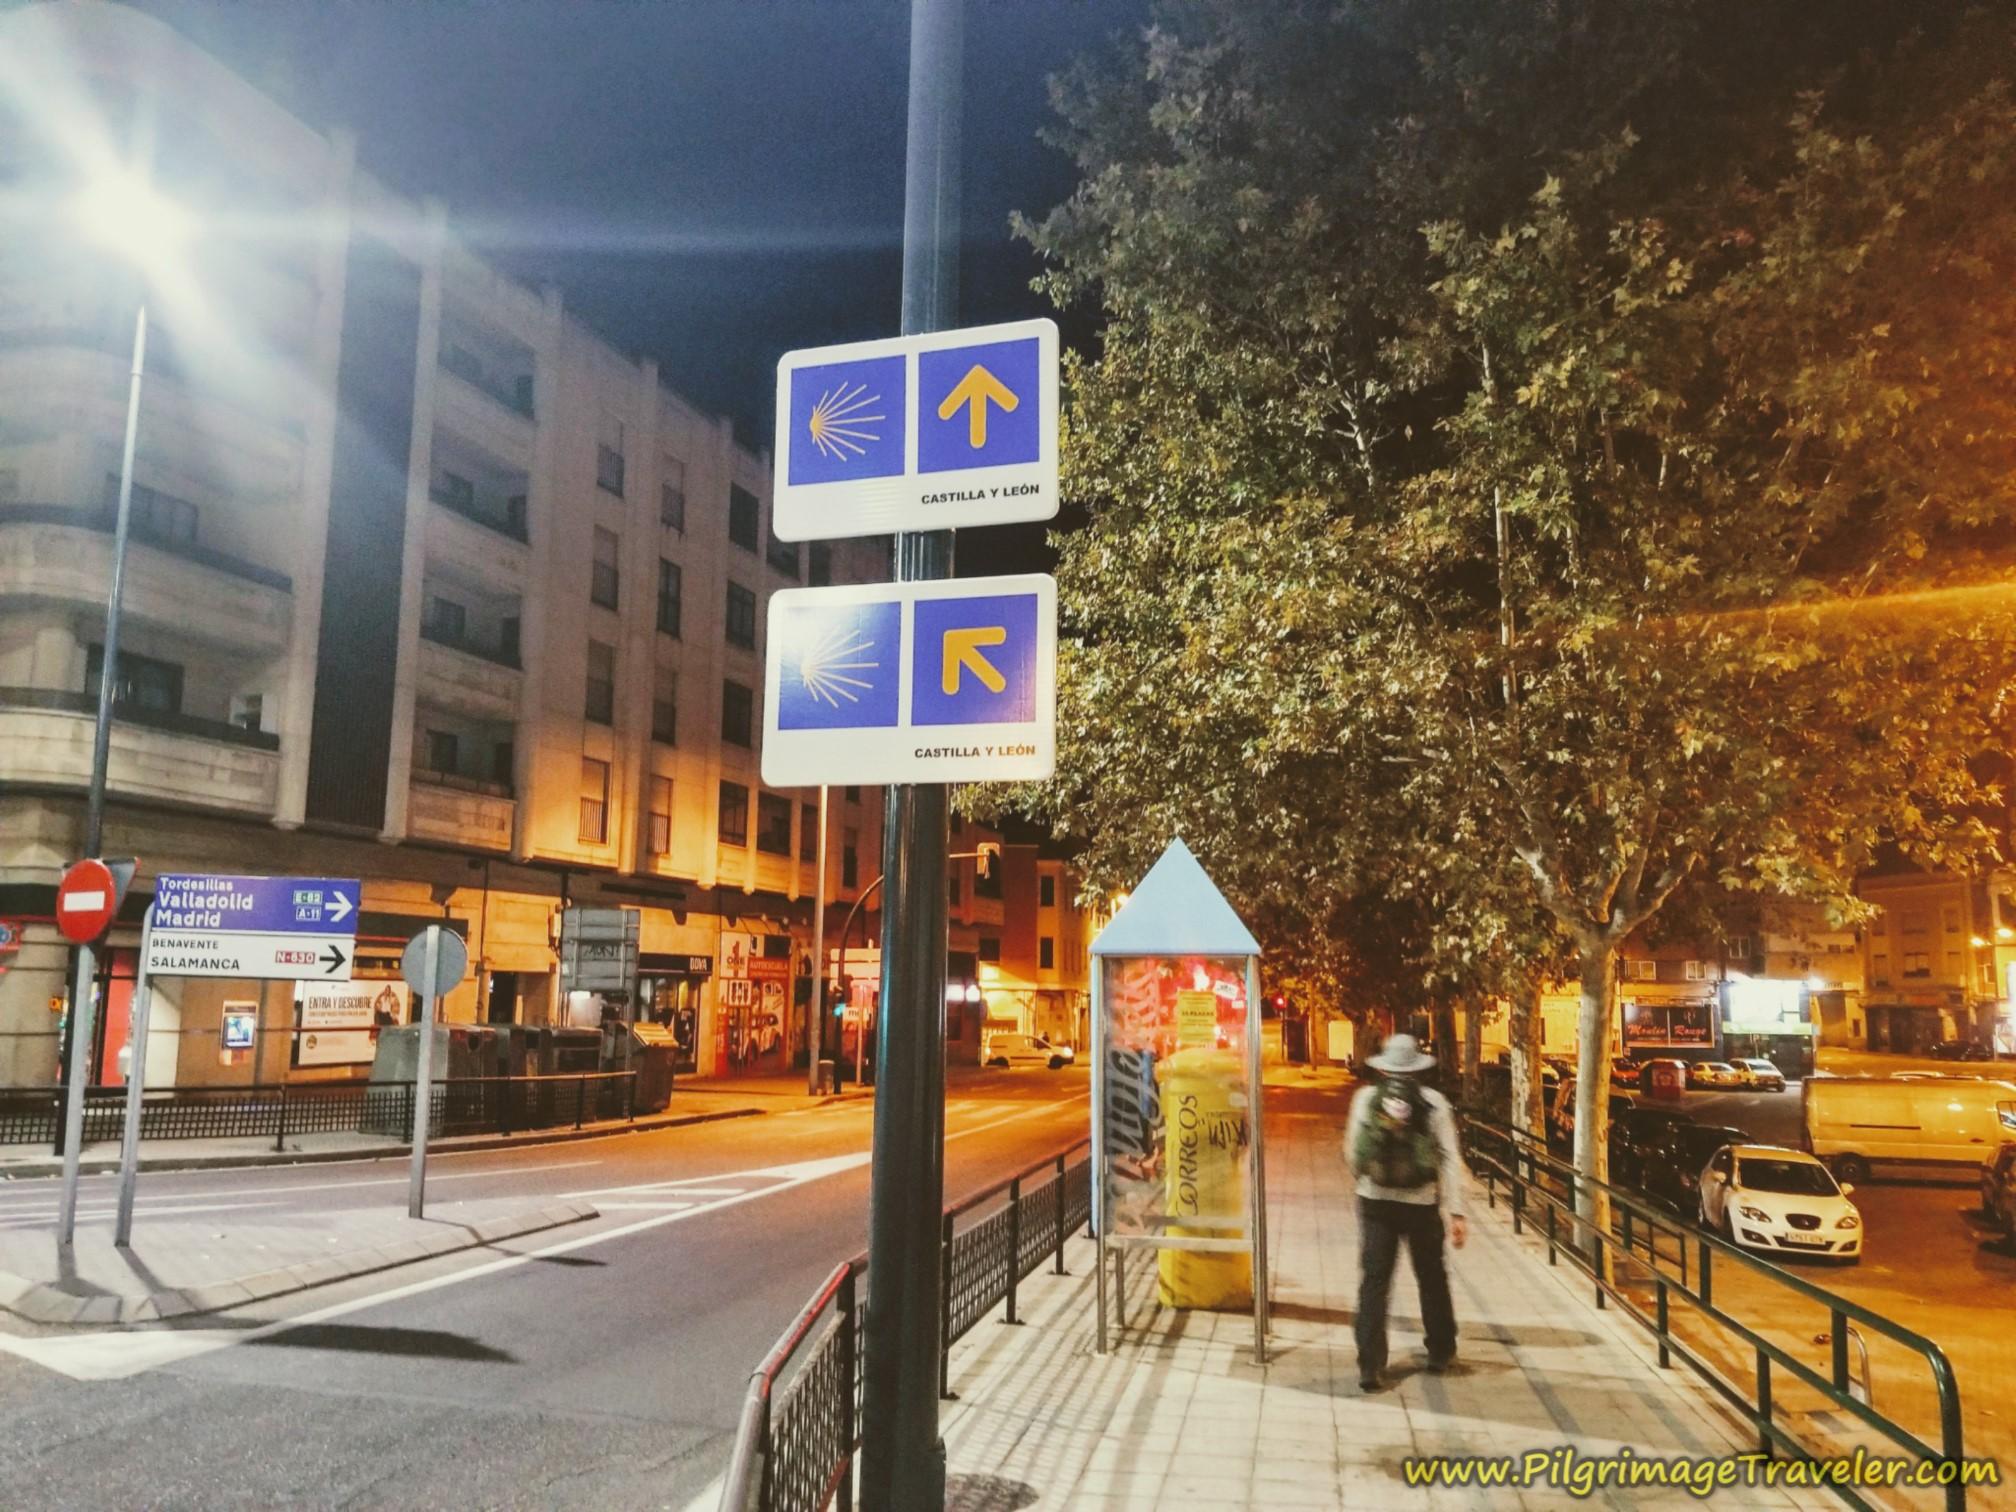 Confusing Double Arrow on the Vía de la Plata from Zamora to Montamarta